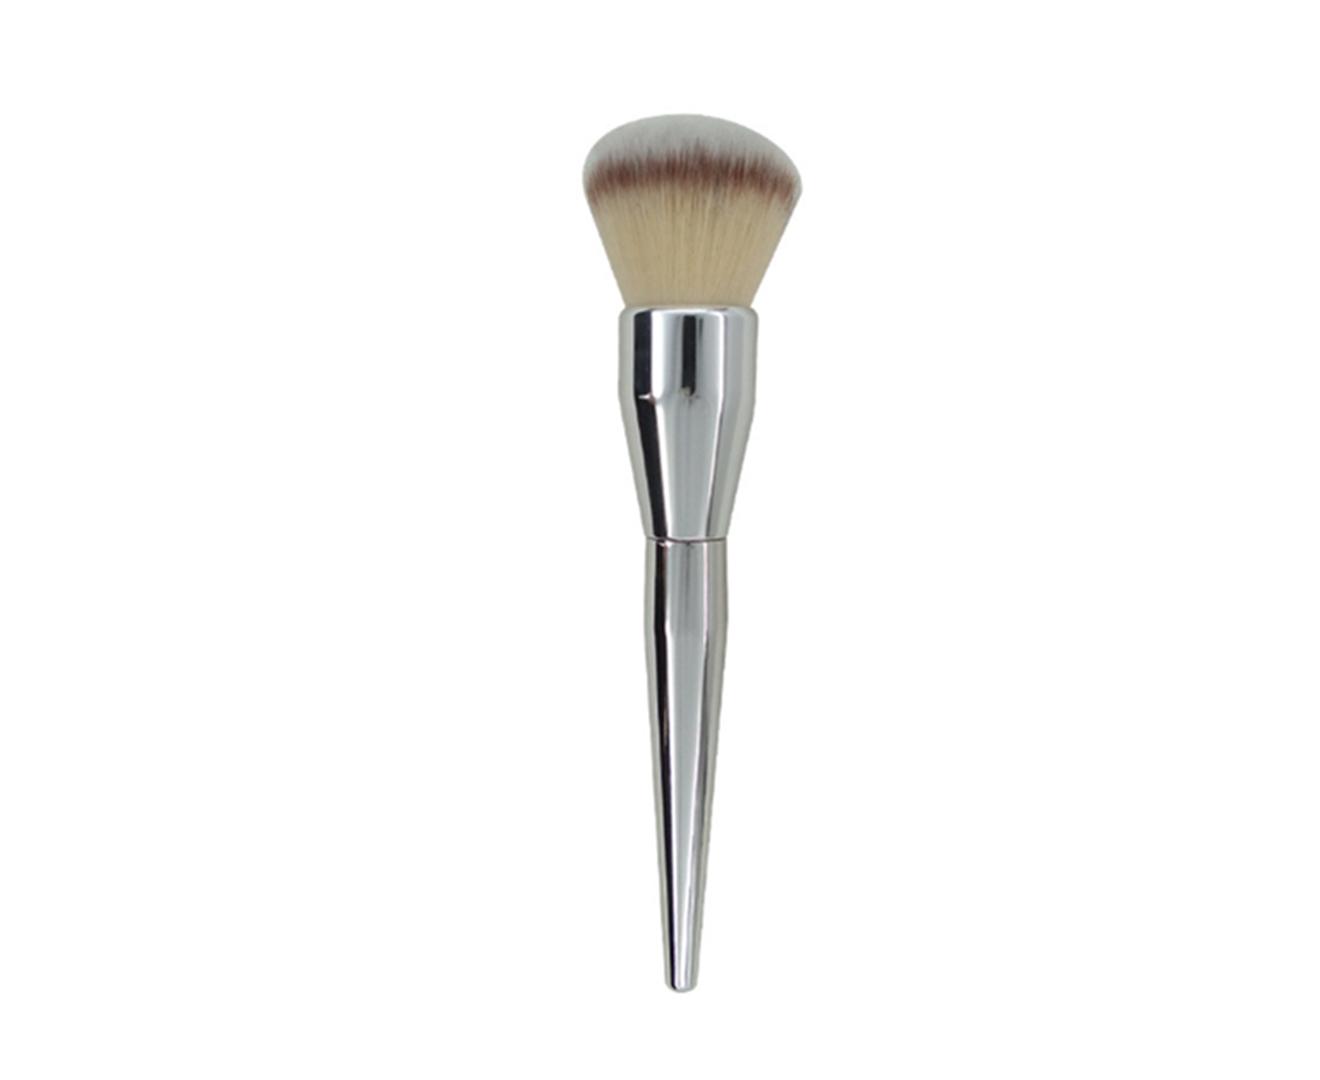 Powder Makeup Brush,Contouring Natural Dense Bristles Professional Face Brush - 1